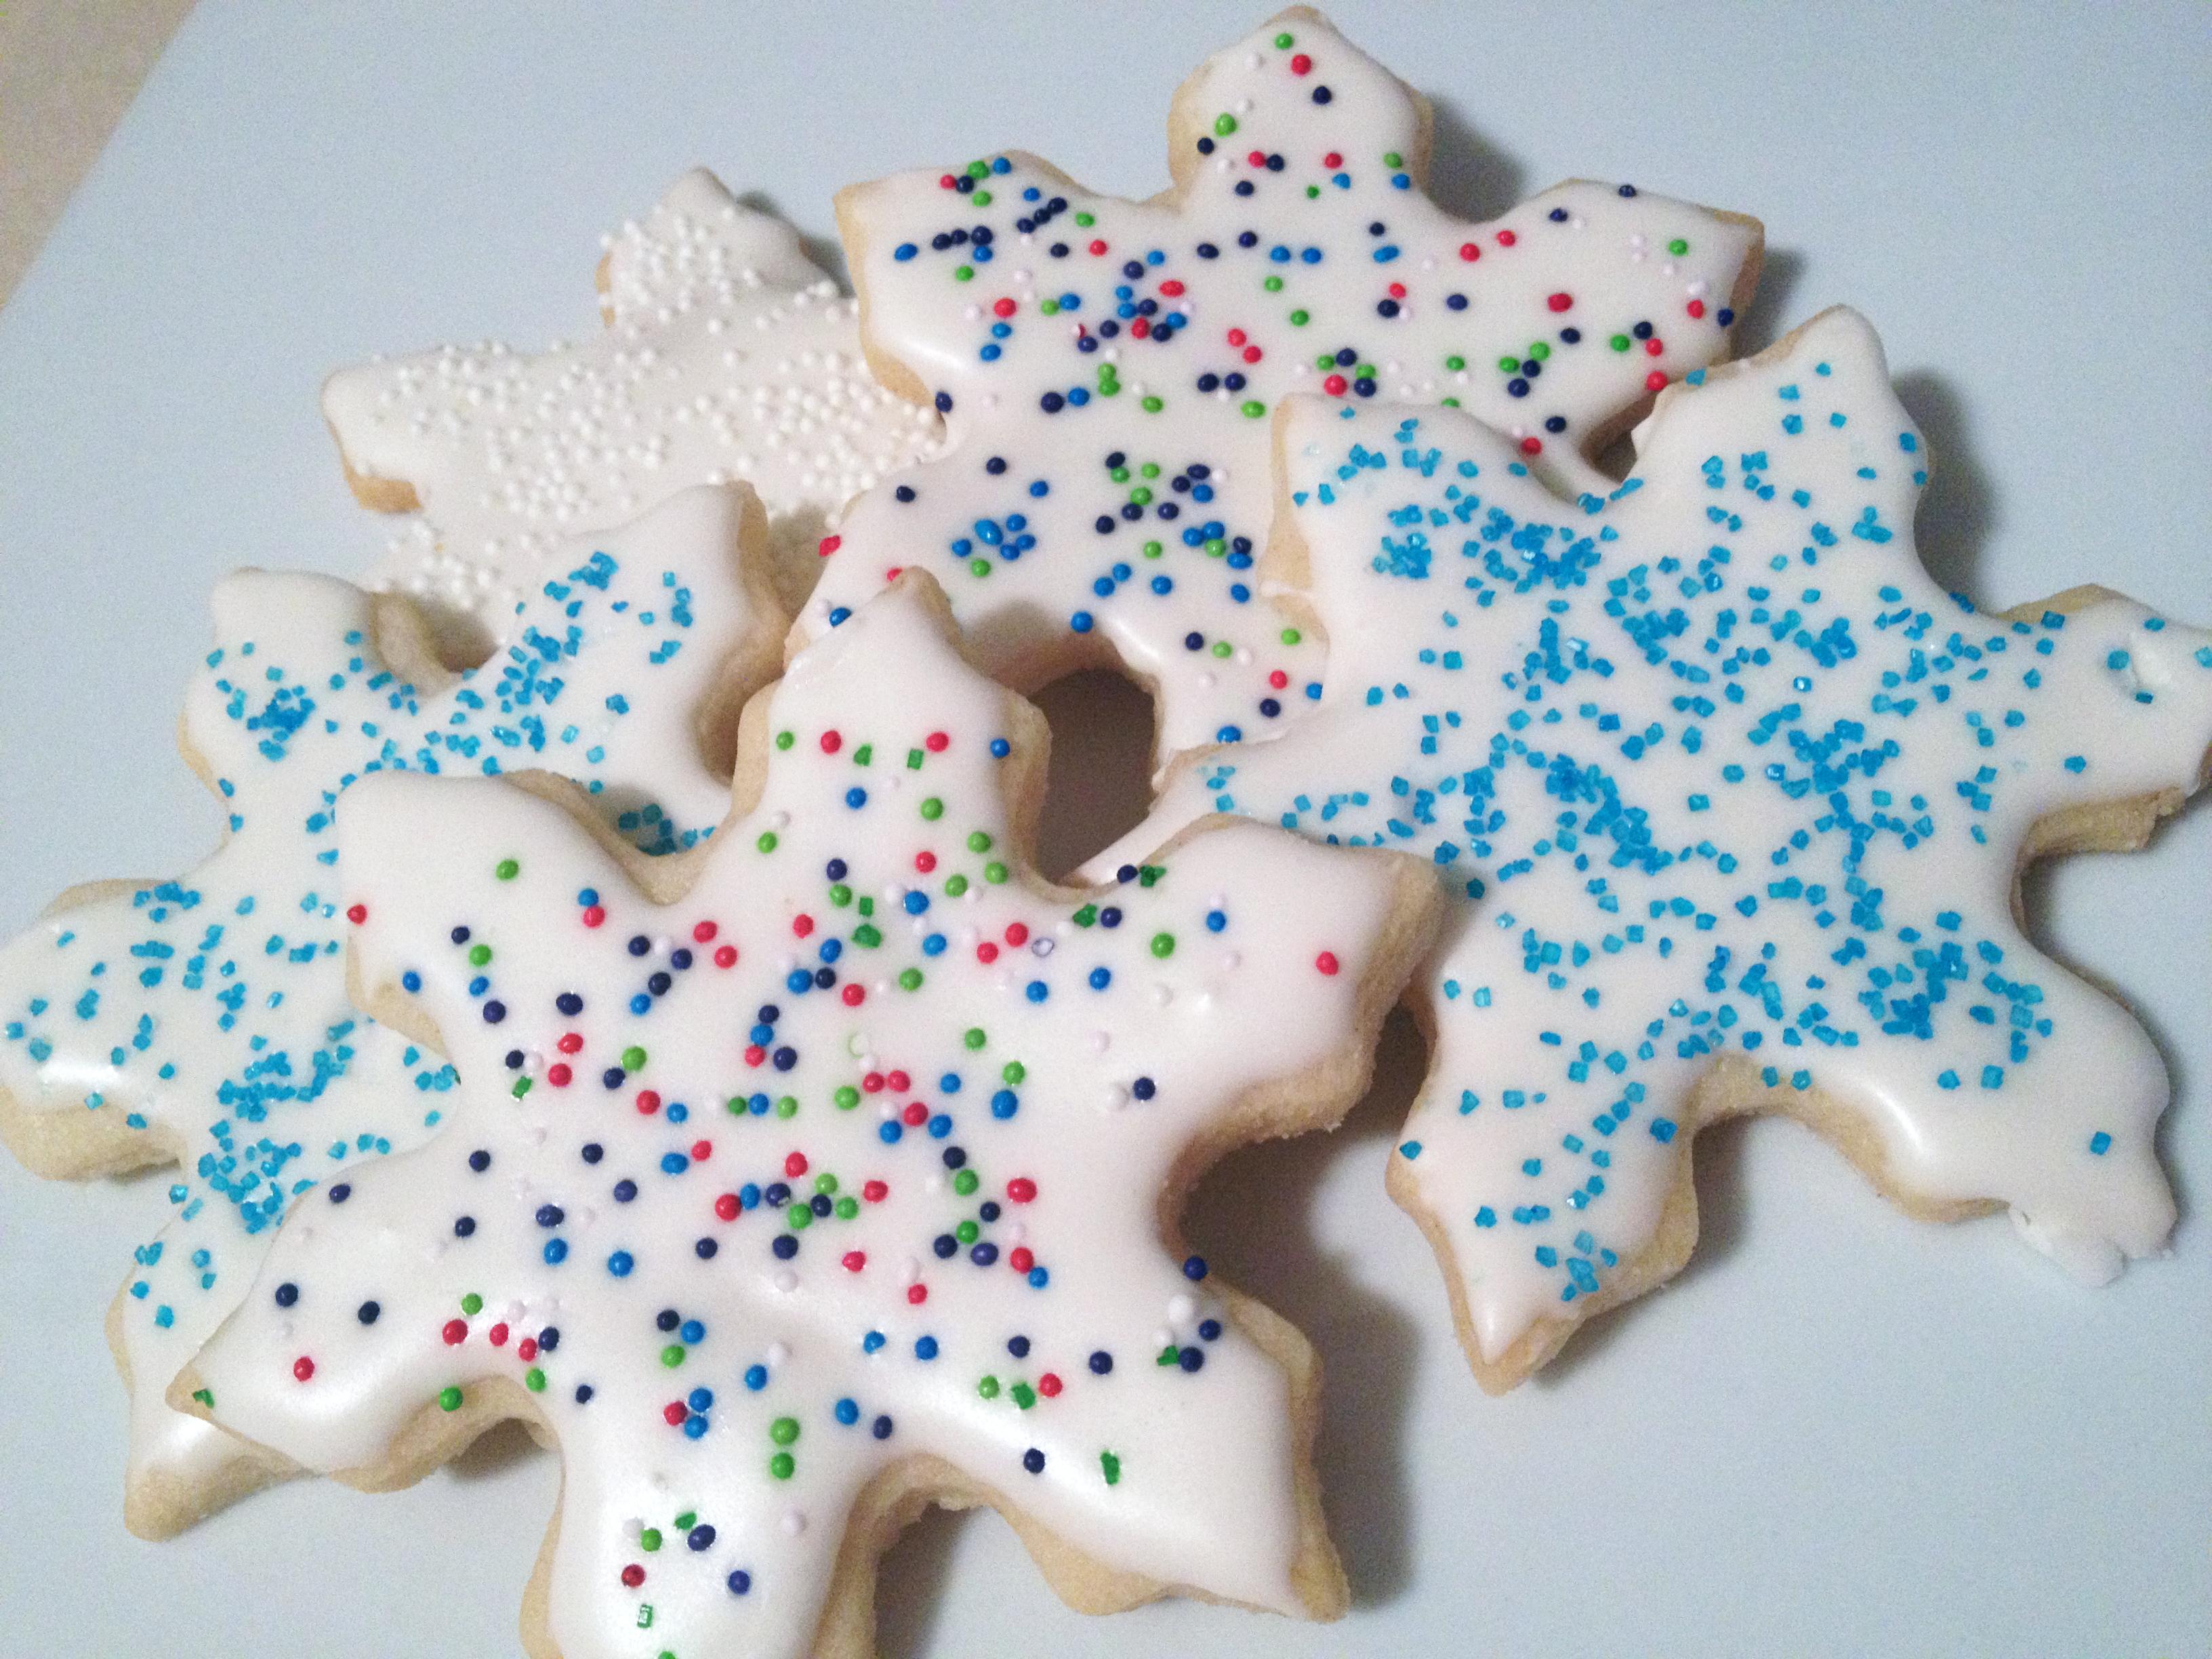 sugar cookies decorated